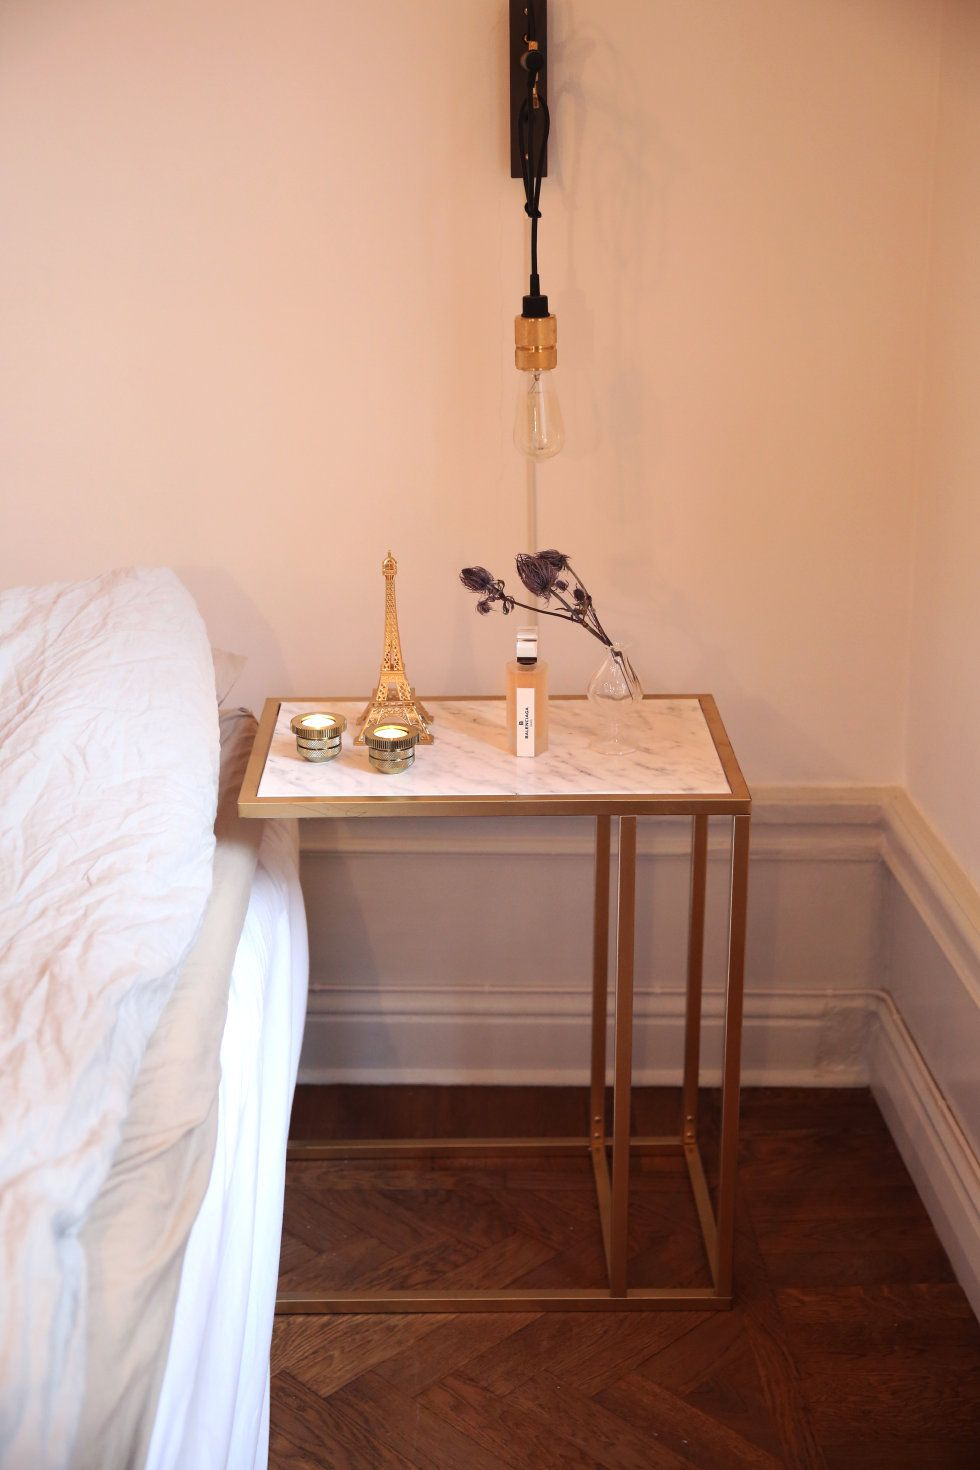 petra tung rden diy guldspreja vittsj steg f r steg guide diy pinterest schlafzimmer. Black Bedroom Furniture Sets. Home Design Ideas